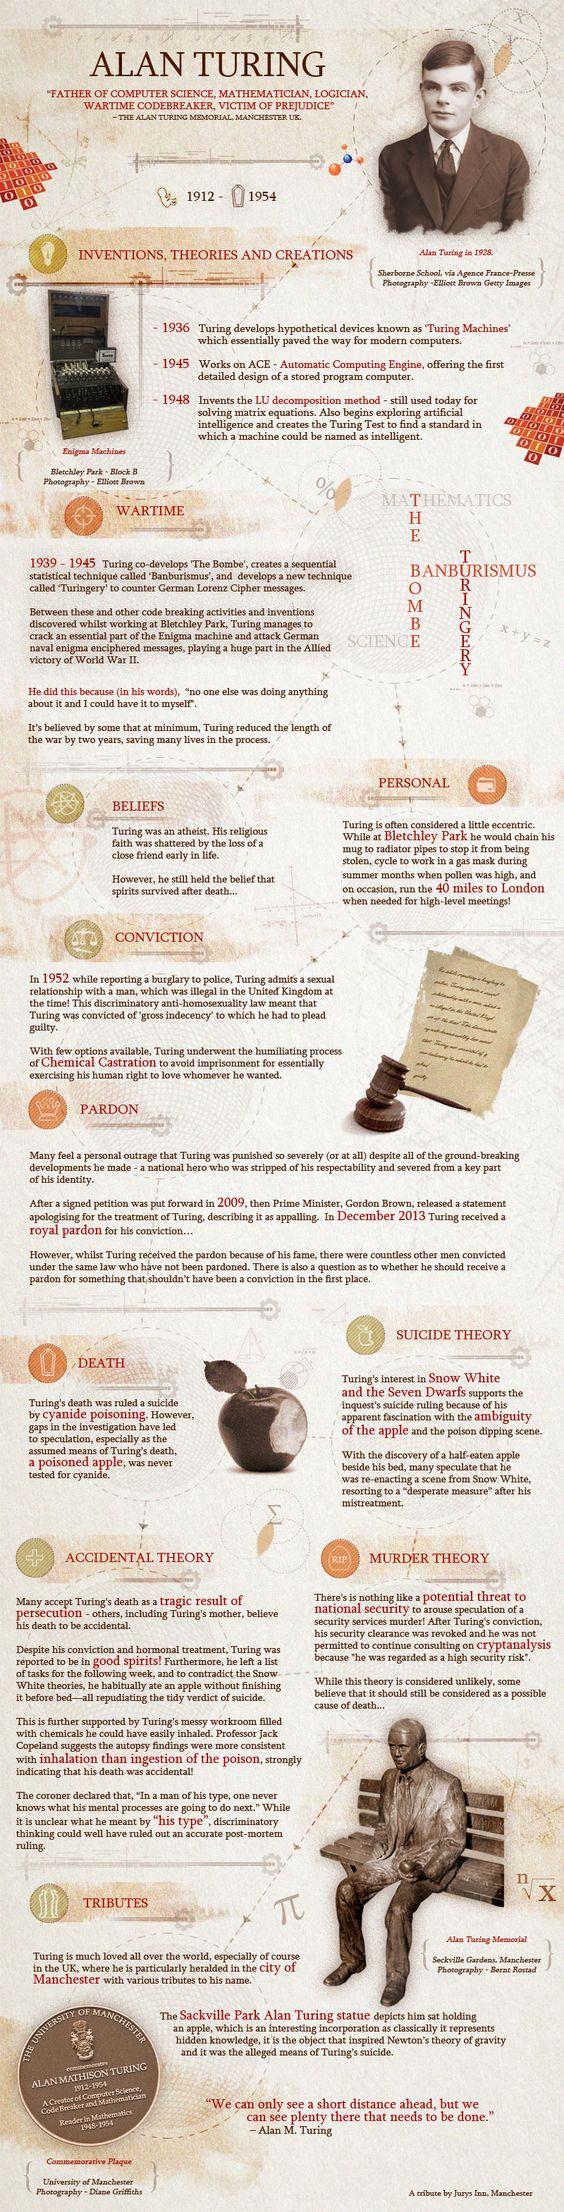 Hola: Una infografía sobre Alan Turing. Un saludo Alan Turing of Manchester, by Jurys Inn Manchester Hotel